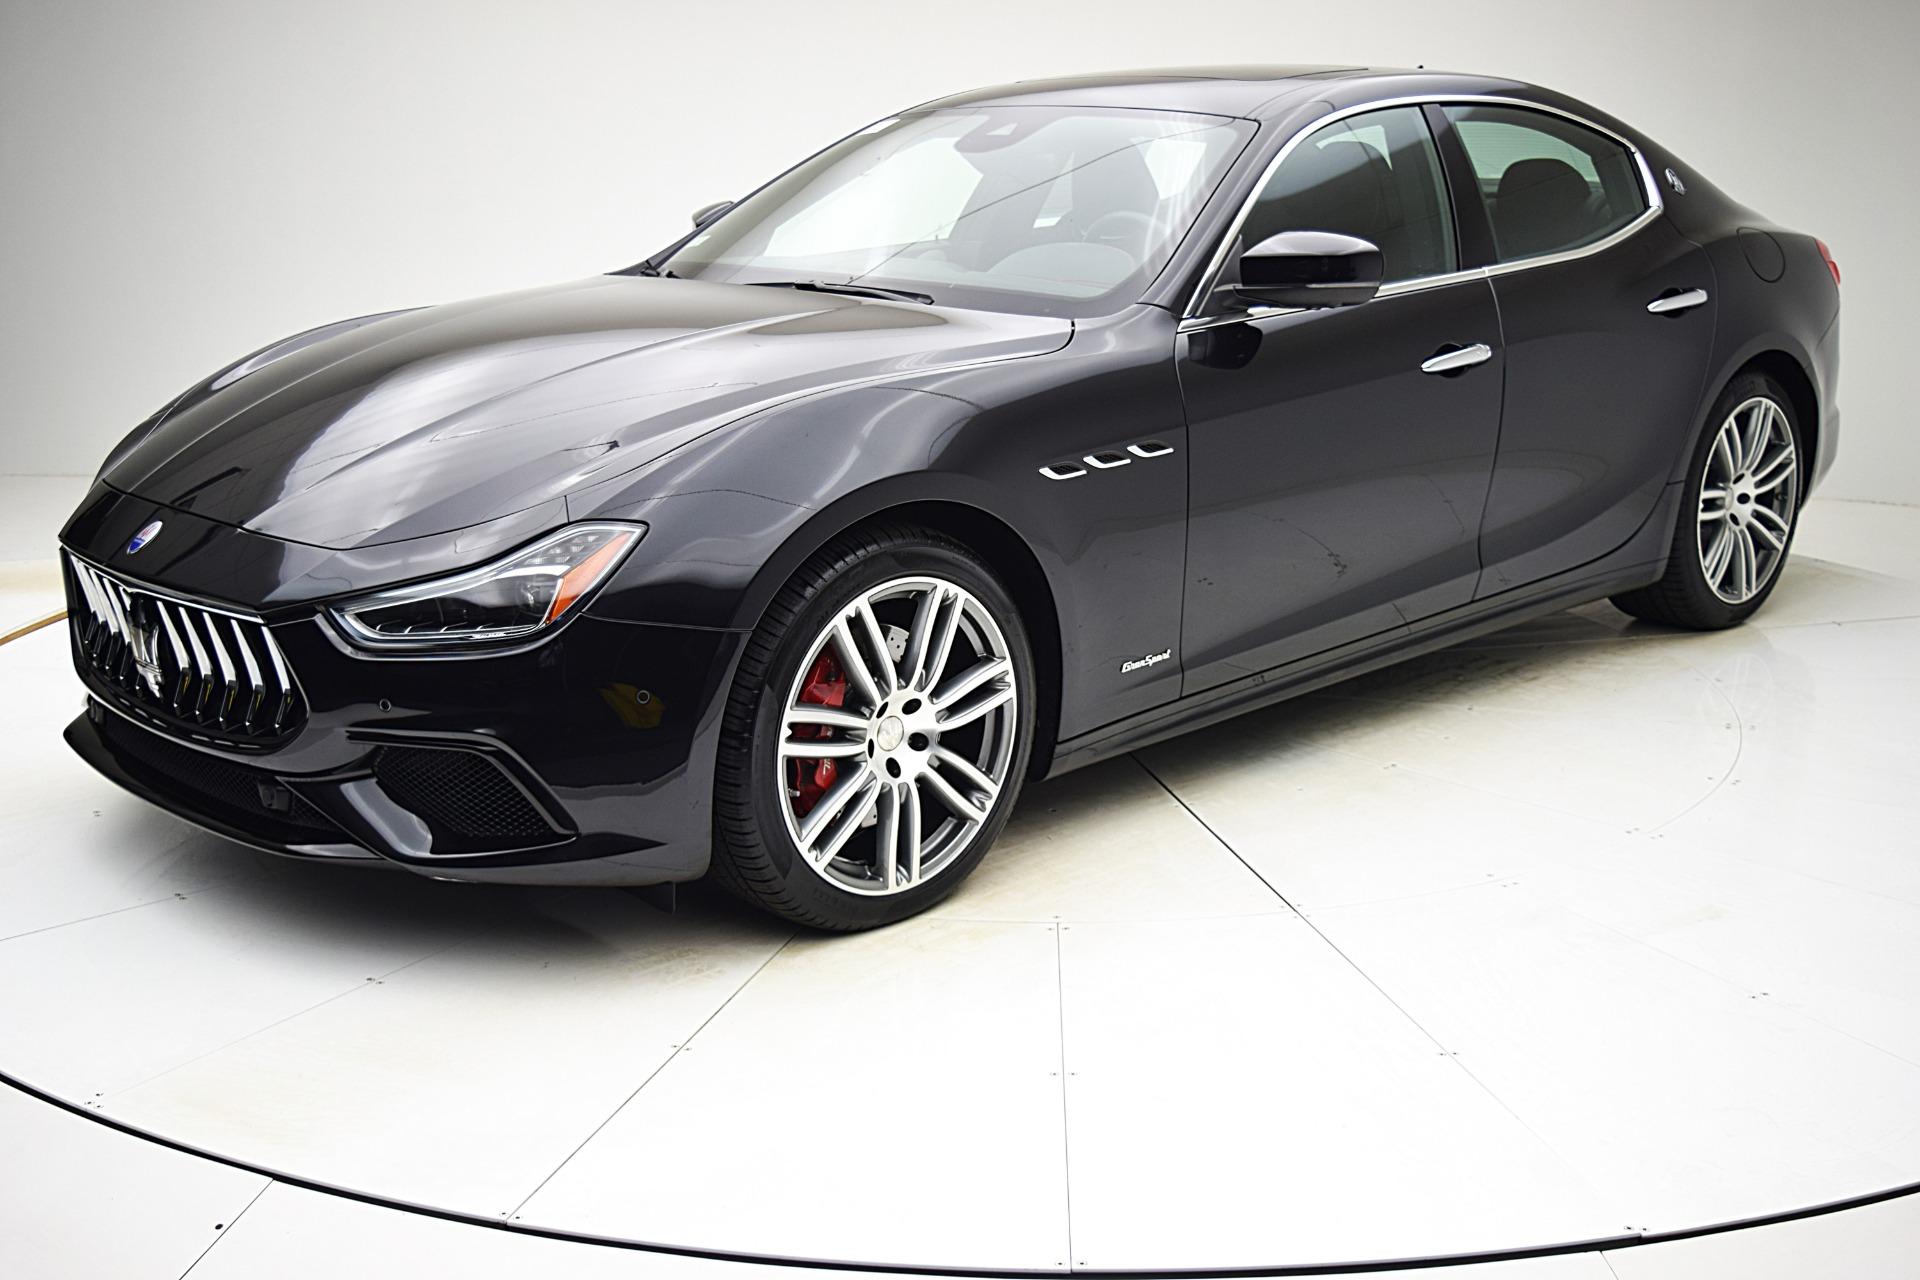 Used 2018 Maserati Ghibli S Q4 GranSport for sale $62,880 at Bentley Palmyra N.J. in Palmyra NJ 08065 2